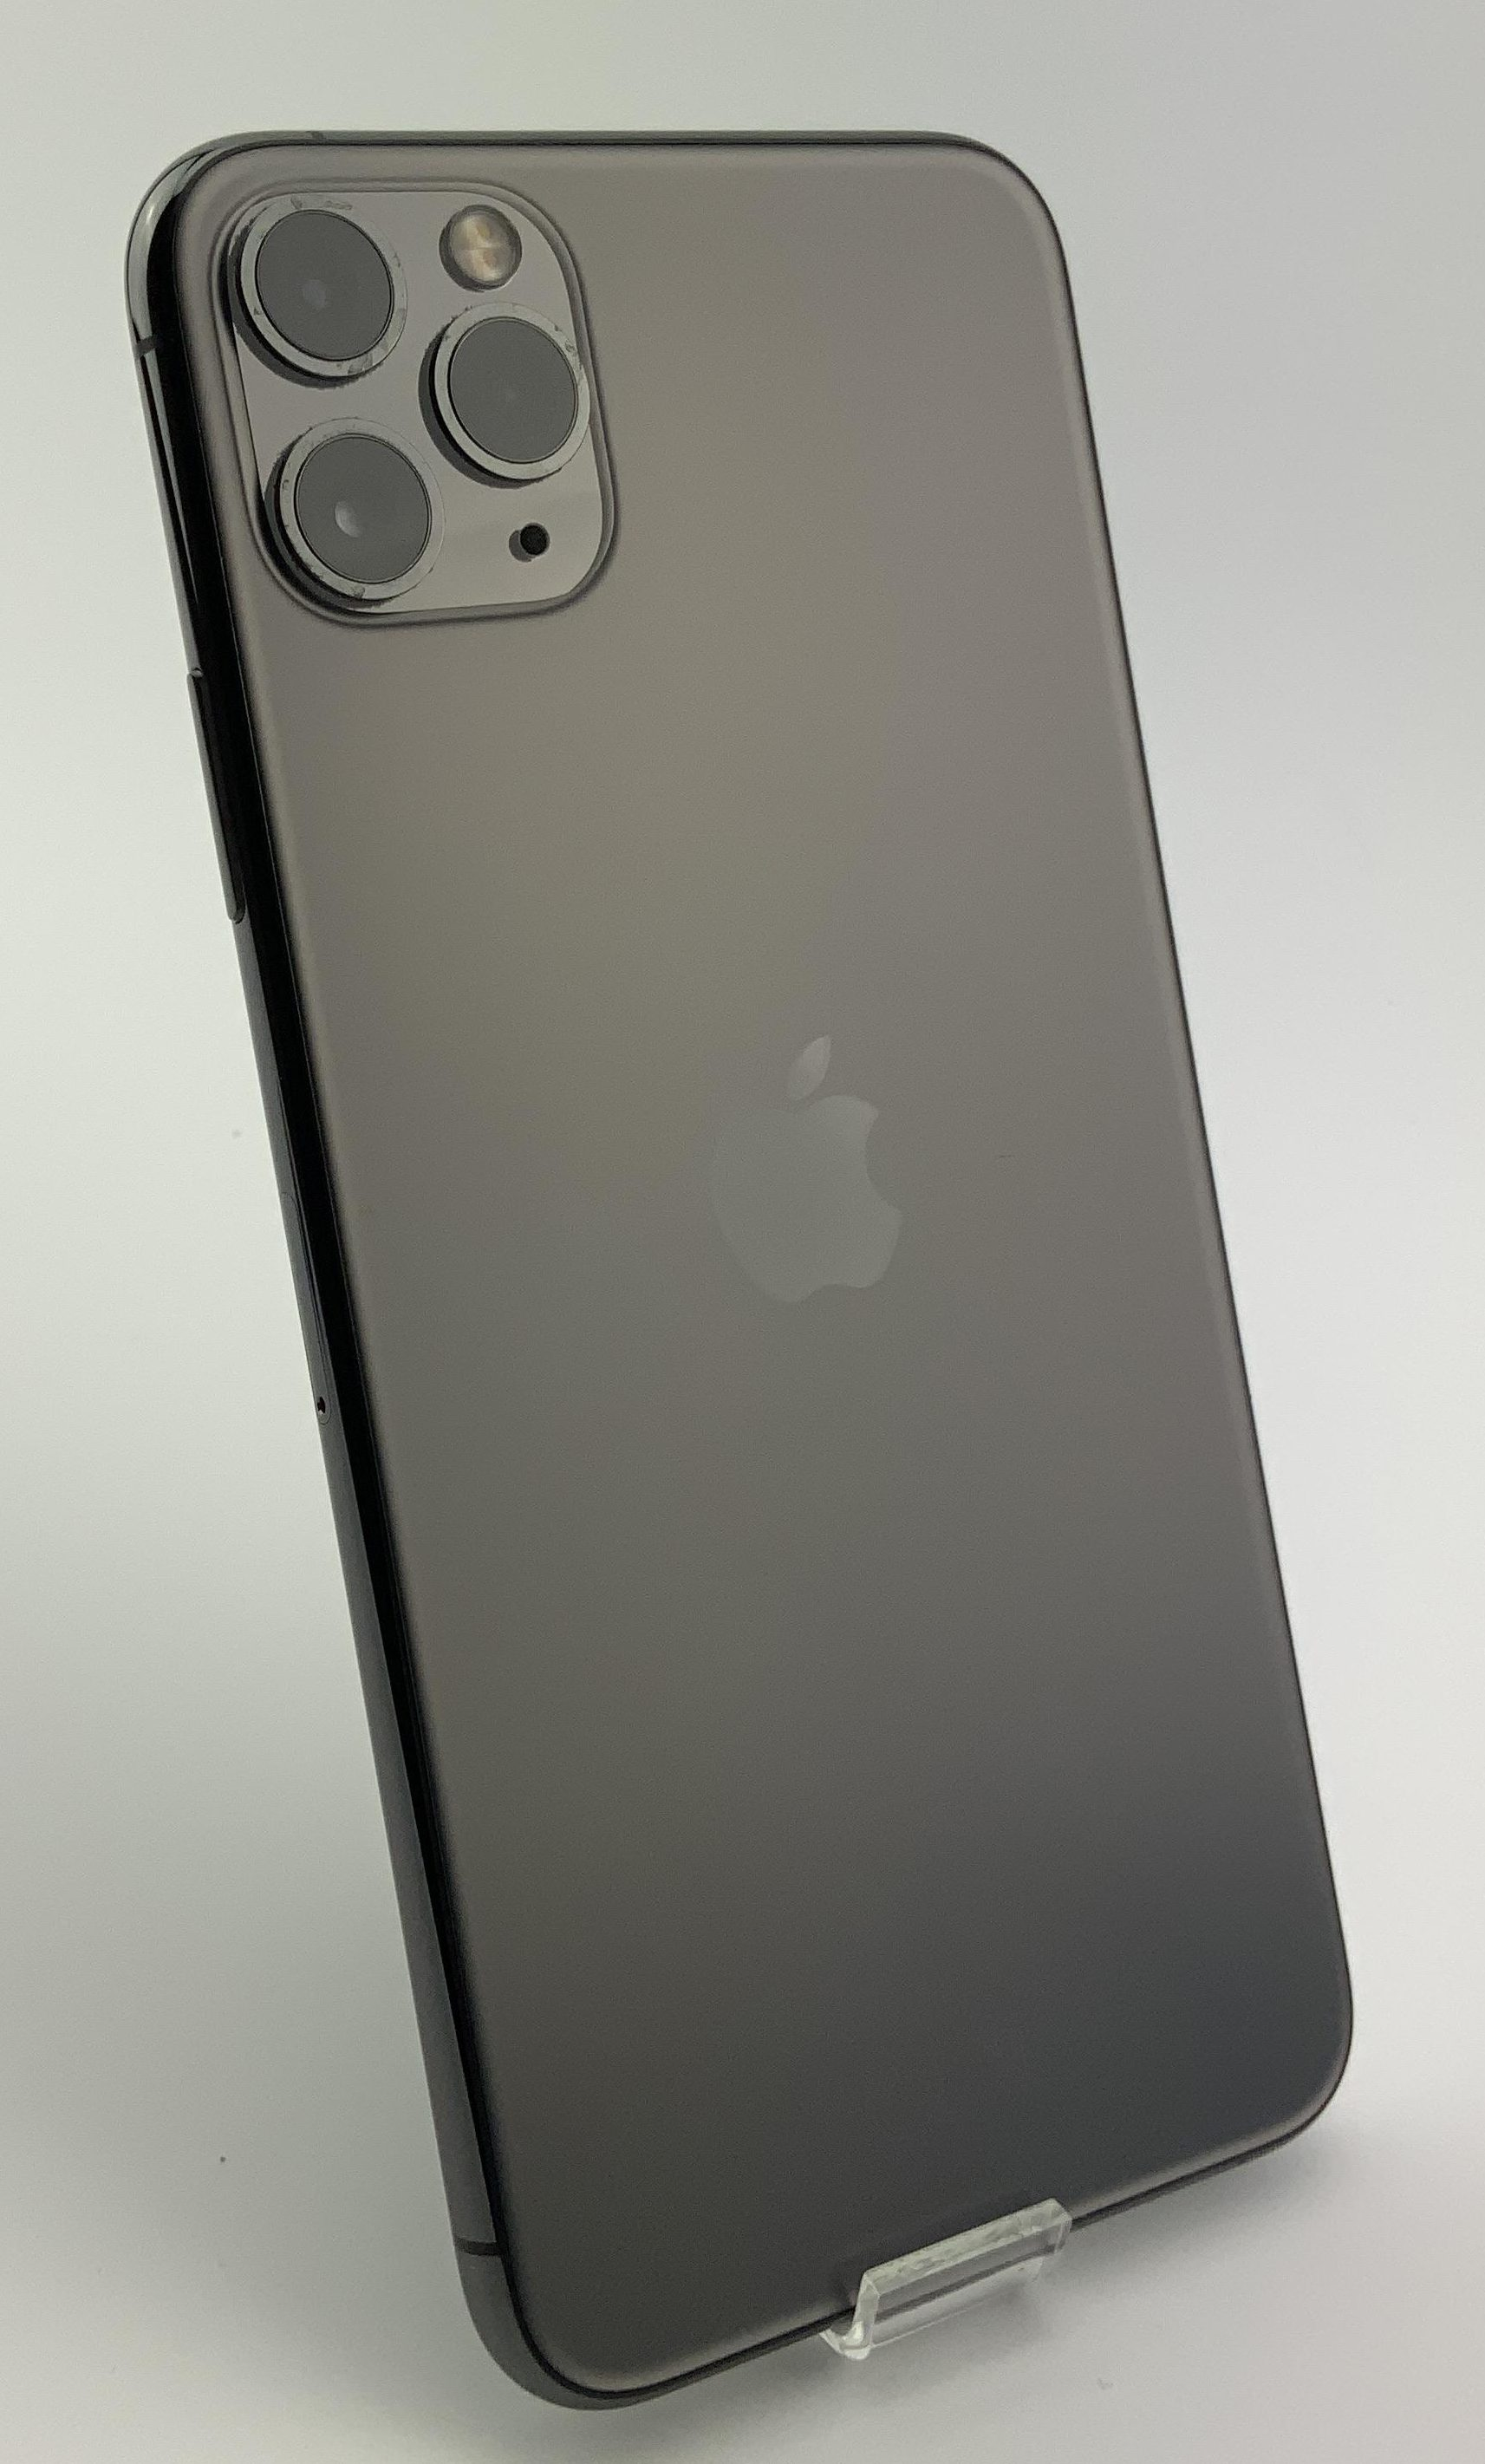 iPhone 11 Pro Max 64GB, 64GB, Space Gray, imagen 2